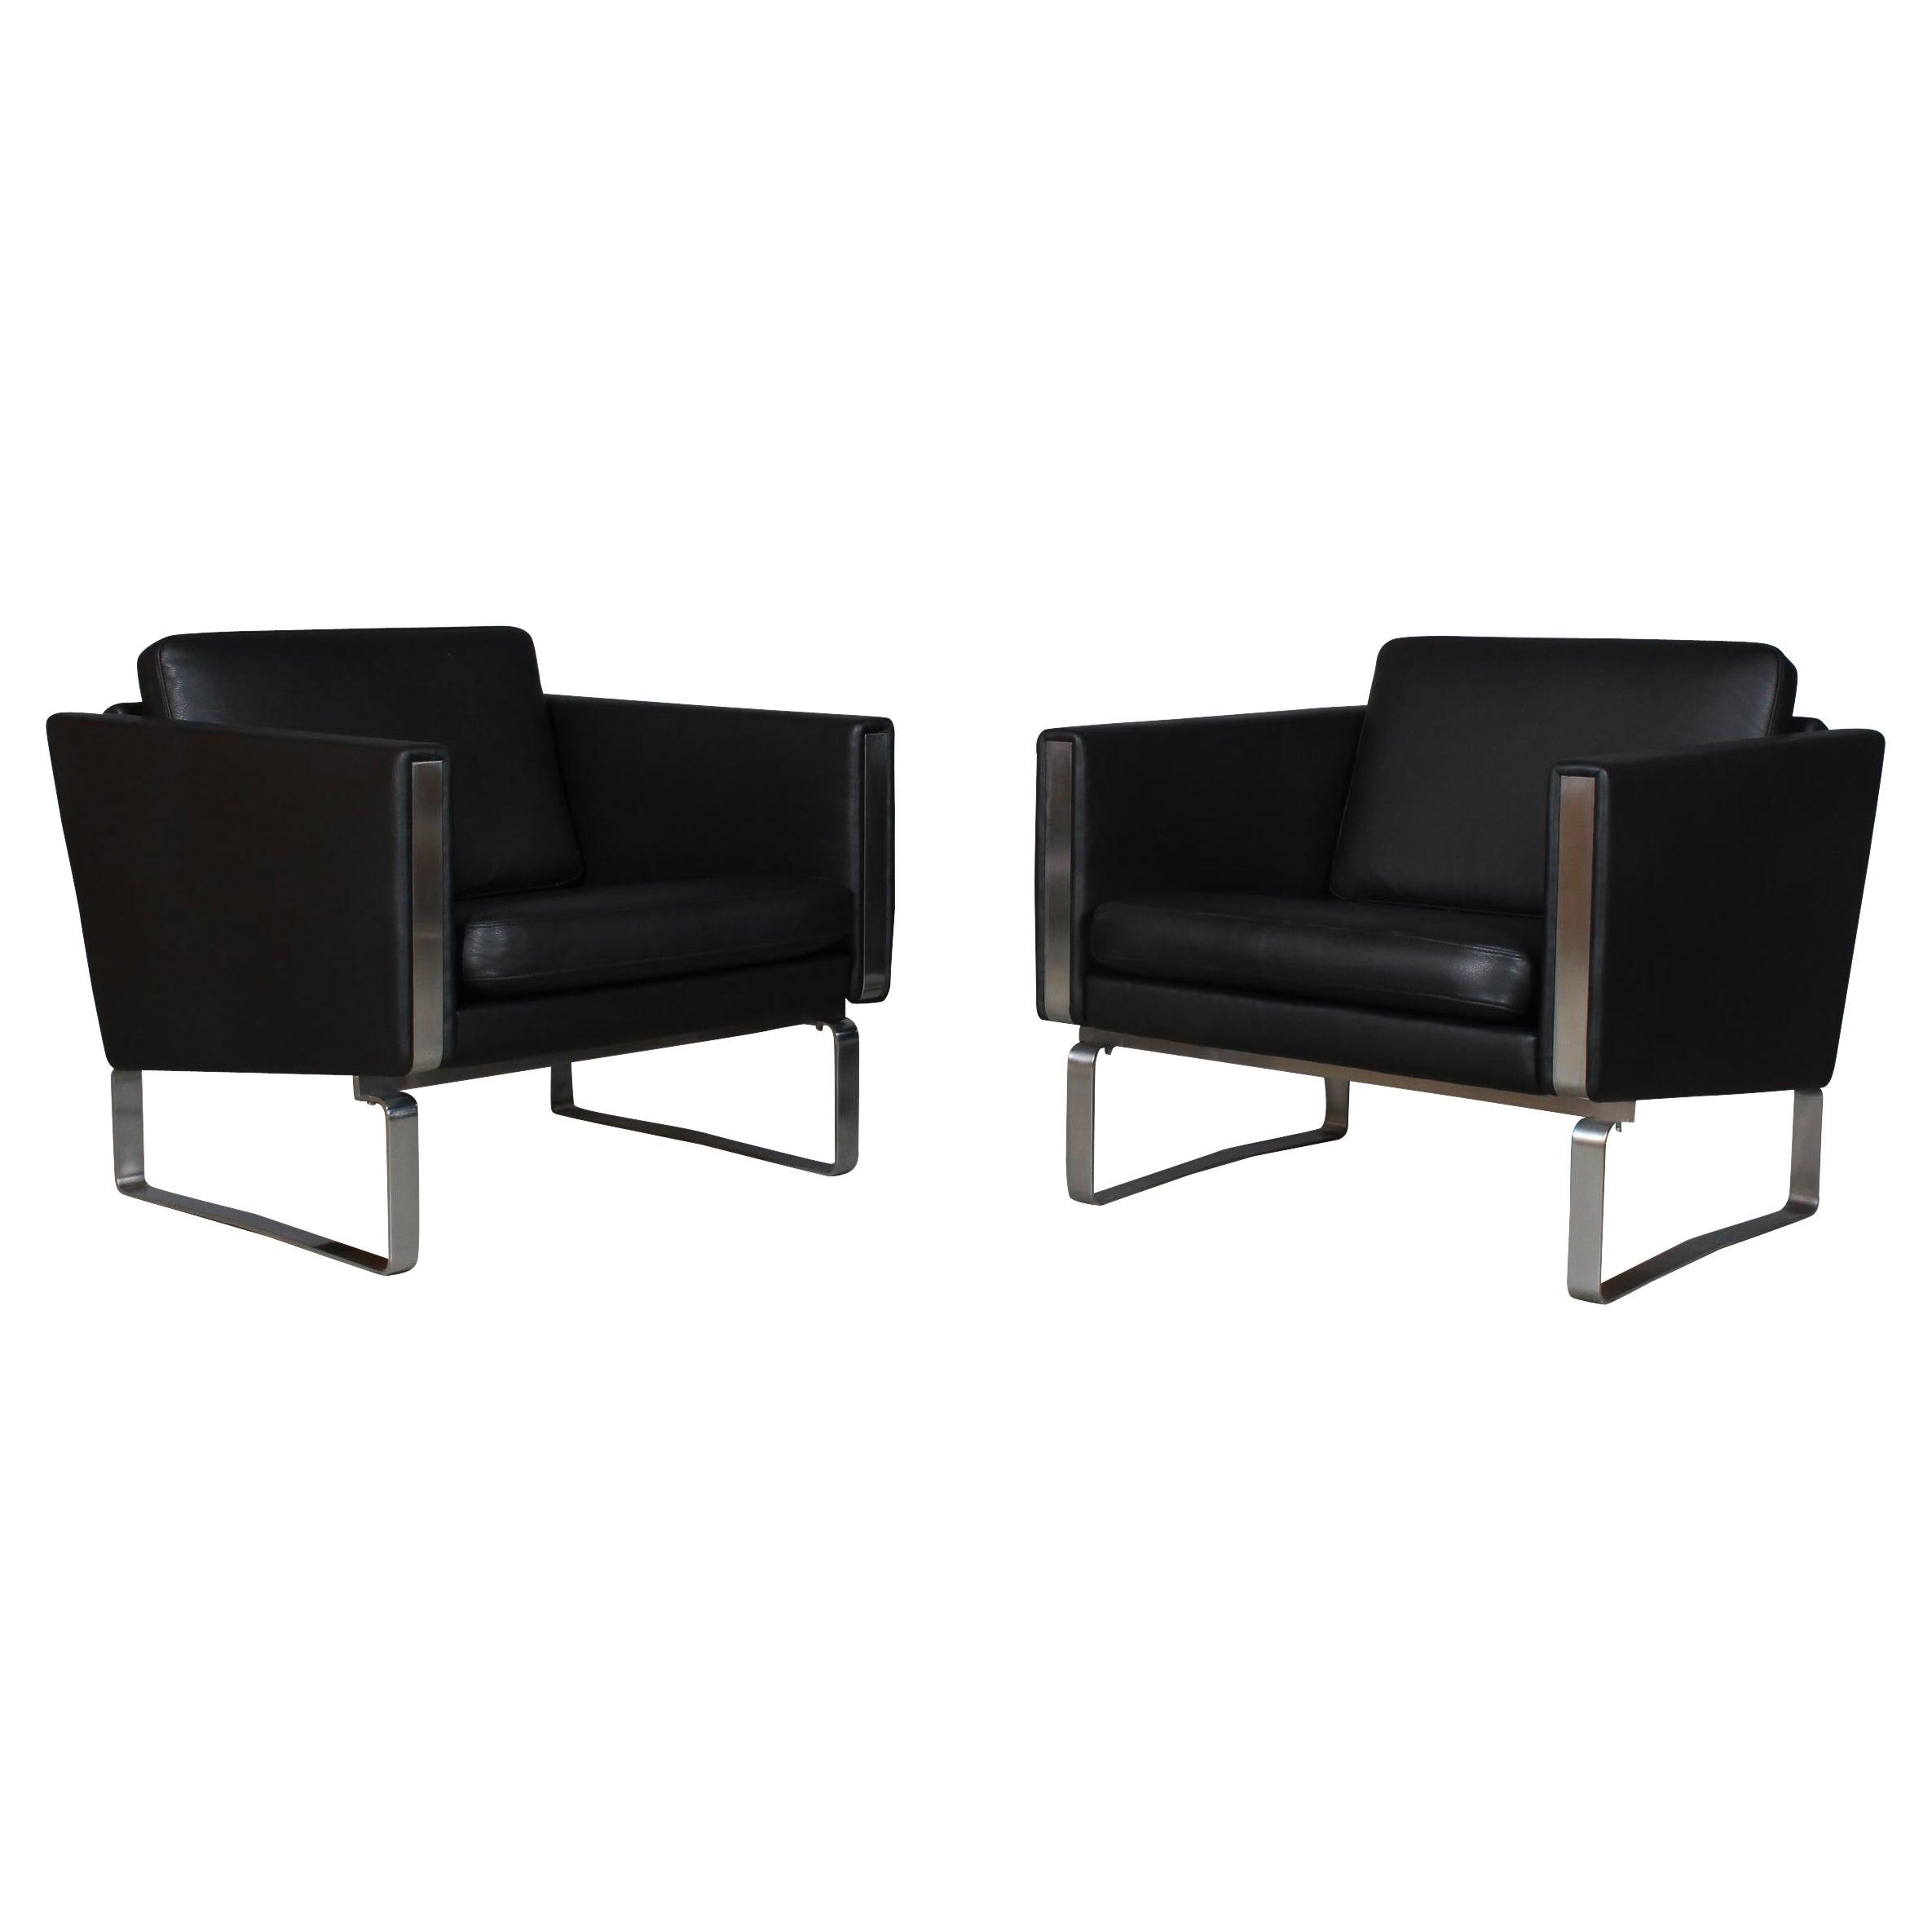 Hans J. Wegner Pair of Lounge Chairs, Model JH-101